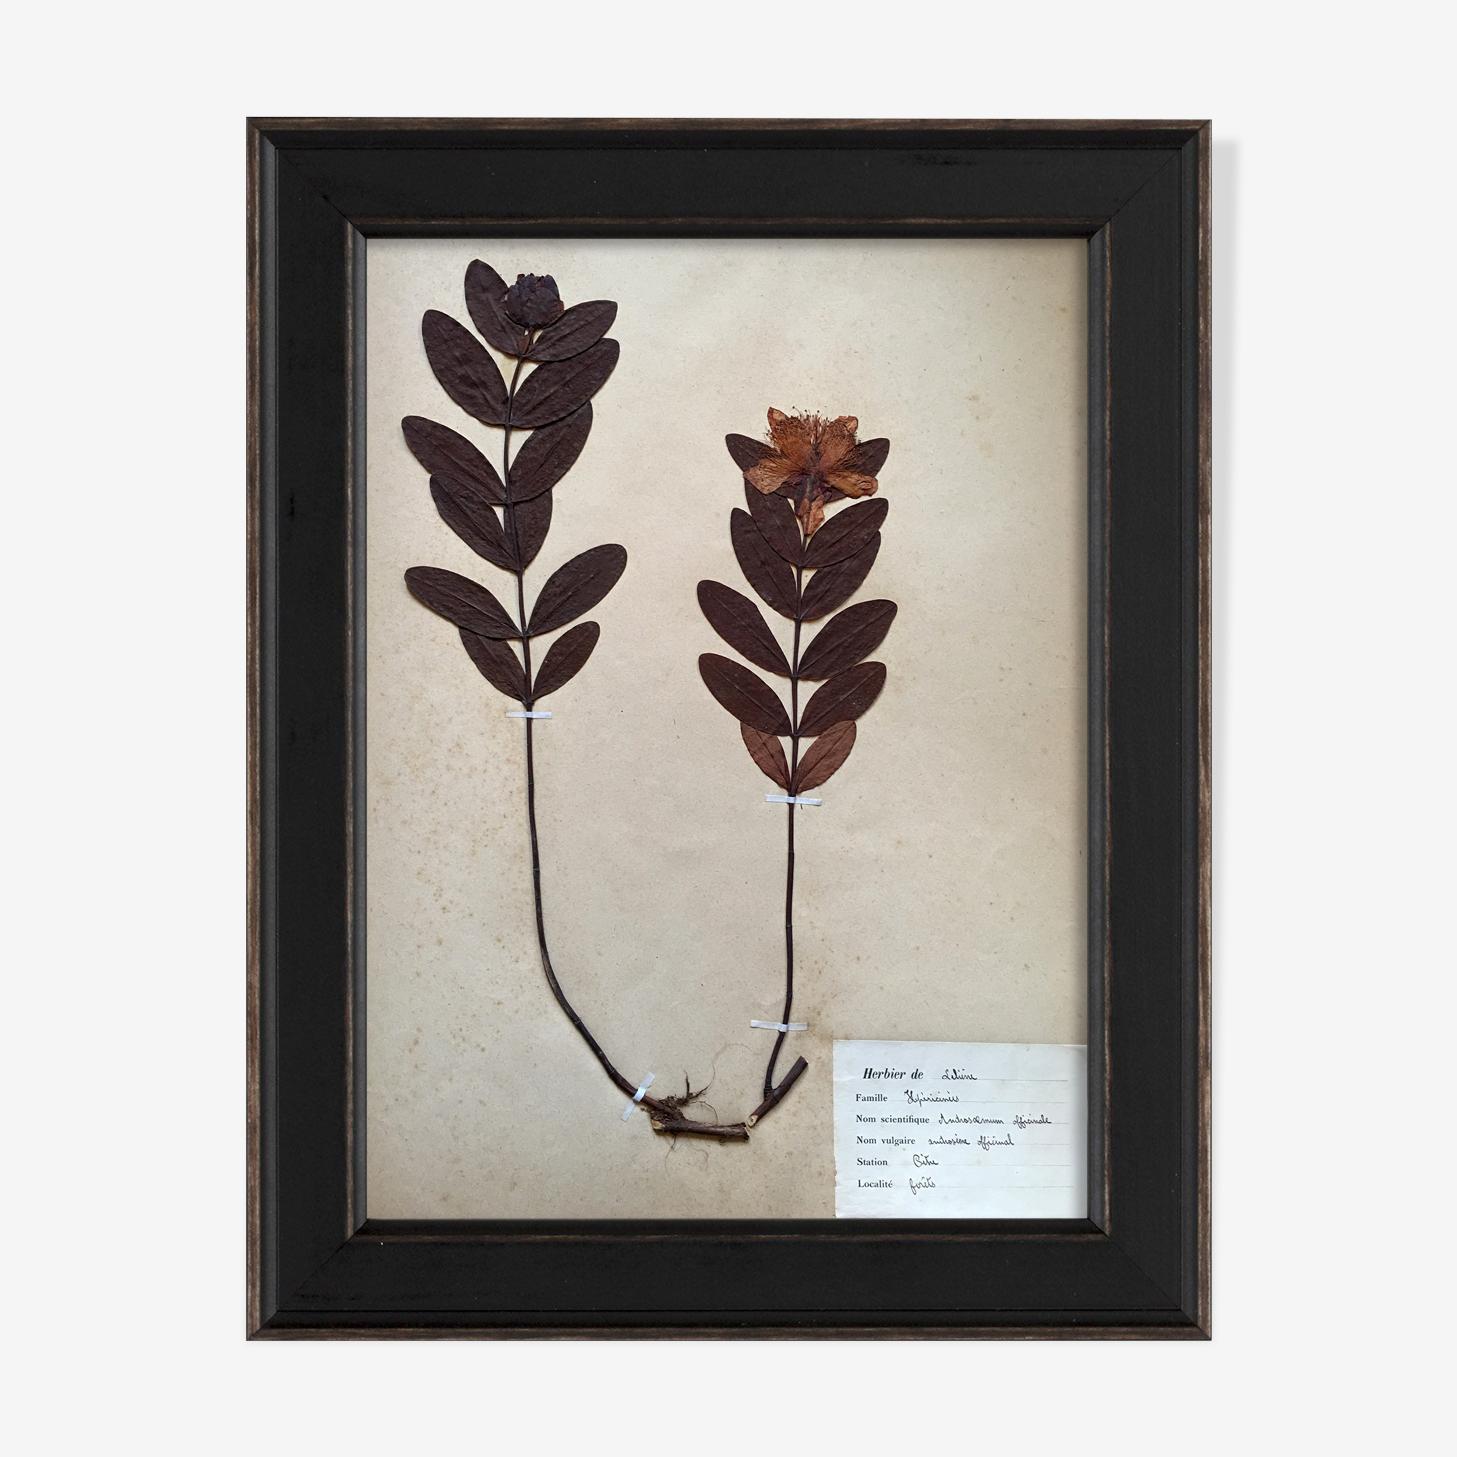 Framed vintage herbarium, dated 1924